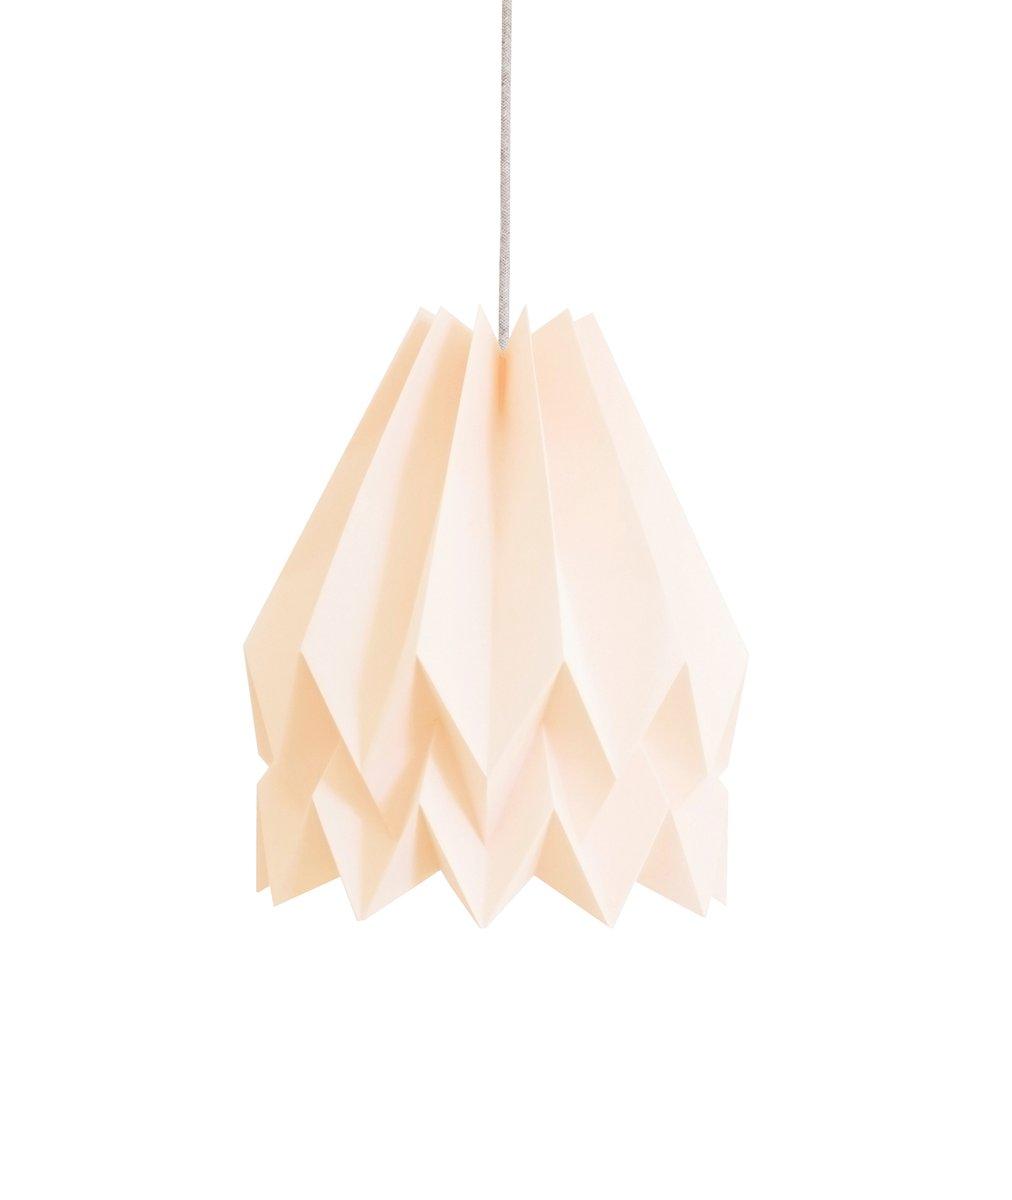 Pastellrosa Origami Lampe von Orikomi